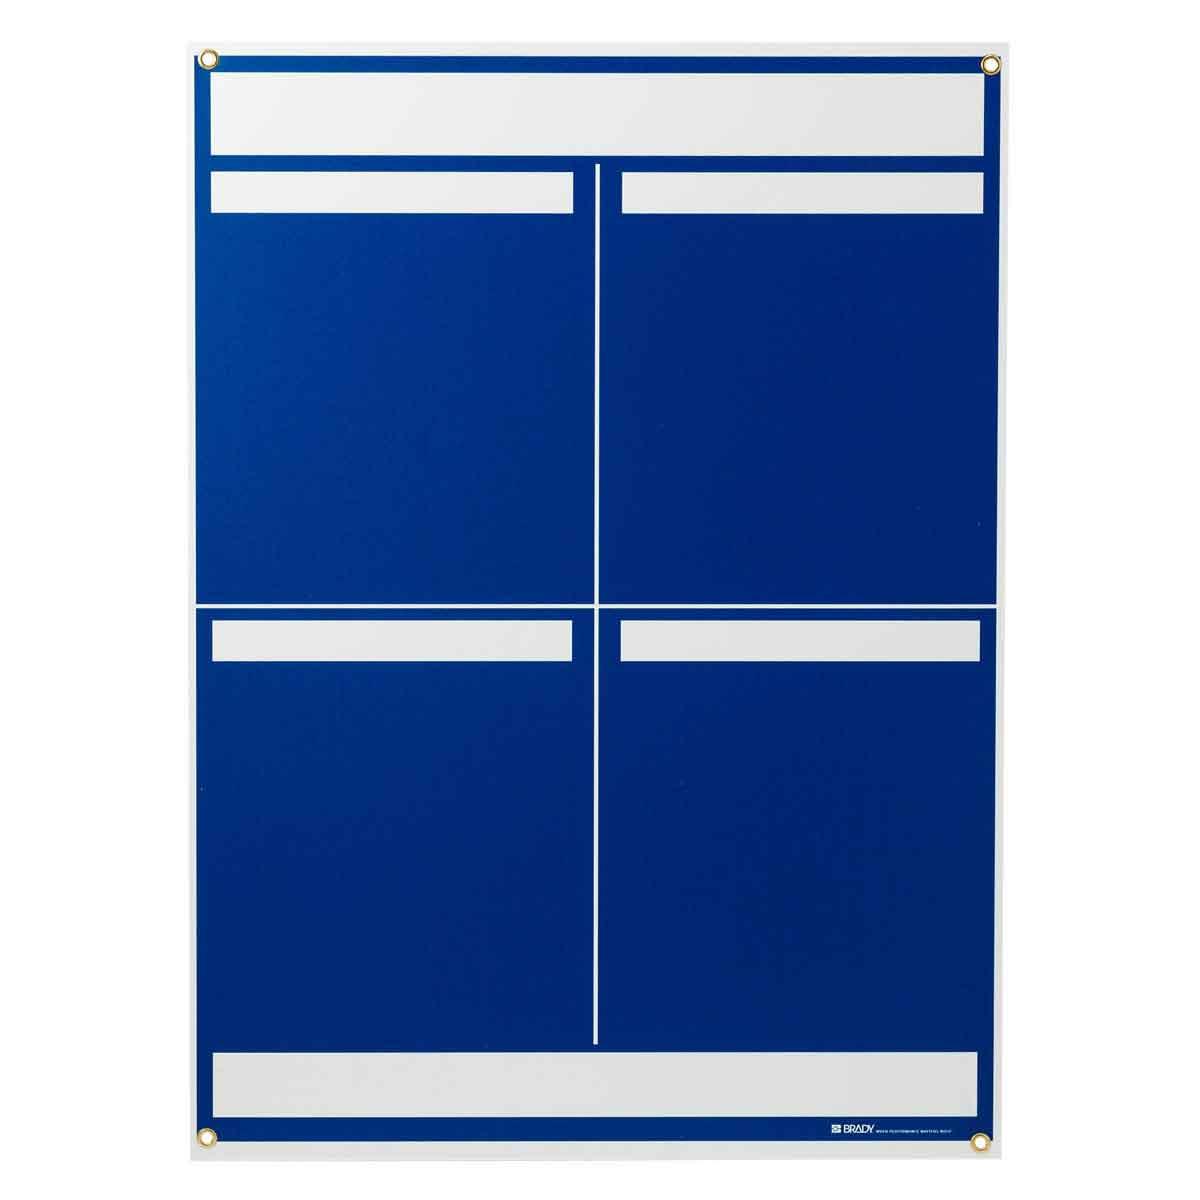 Brady® 114611 4-Panel Information Center Lean Communication Board, 34-1/4 in H, White on Blue, Rectangle Shape, Polystyrene